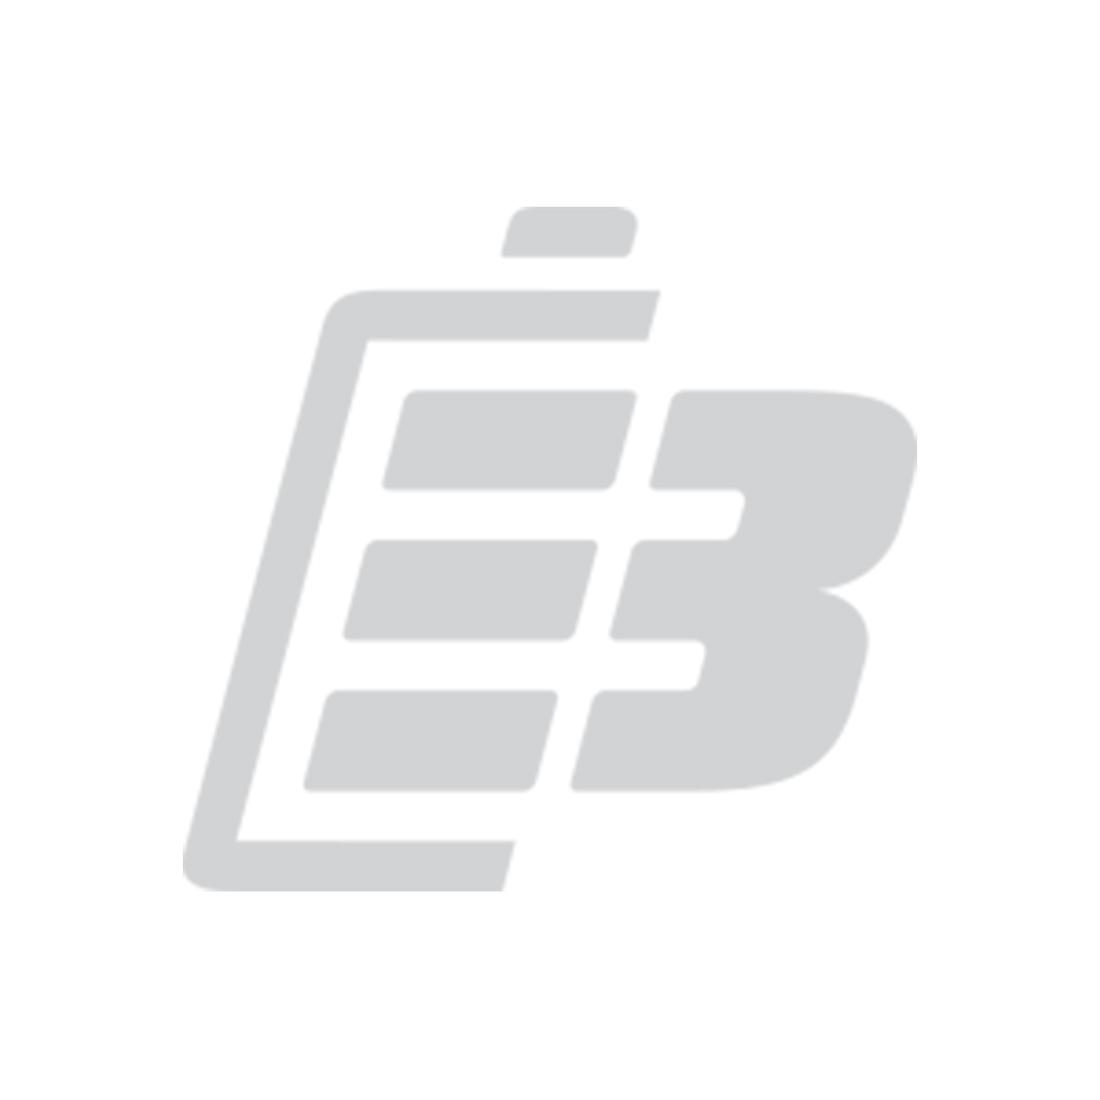 Laptop battery Acer Aspire 9400_1